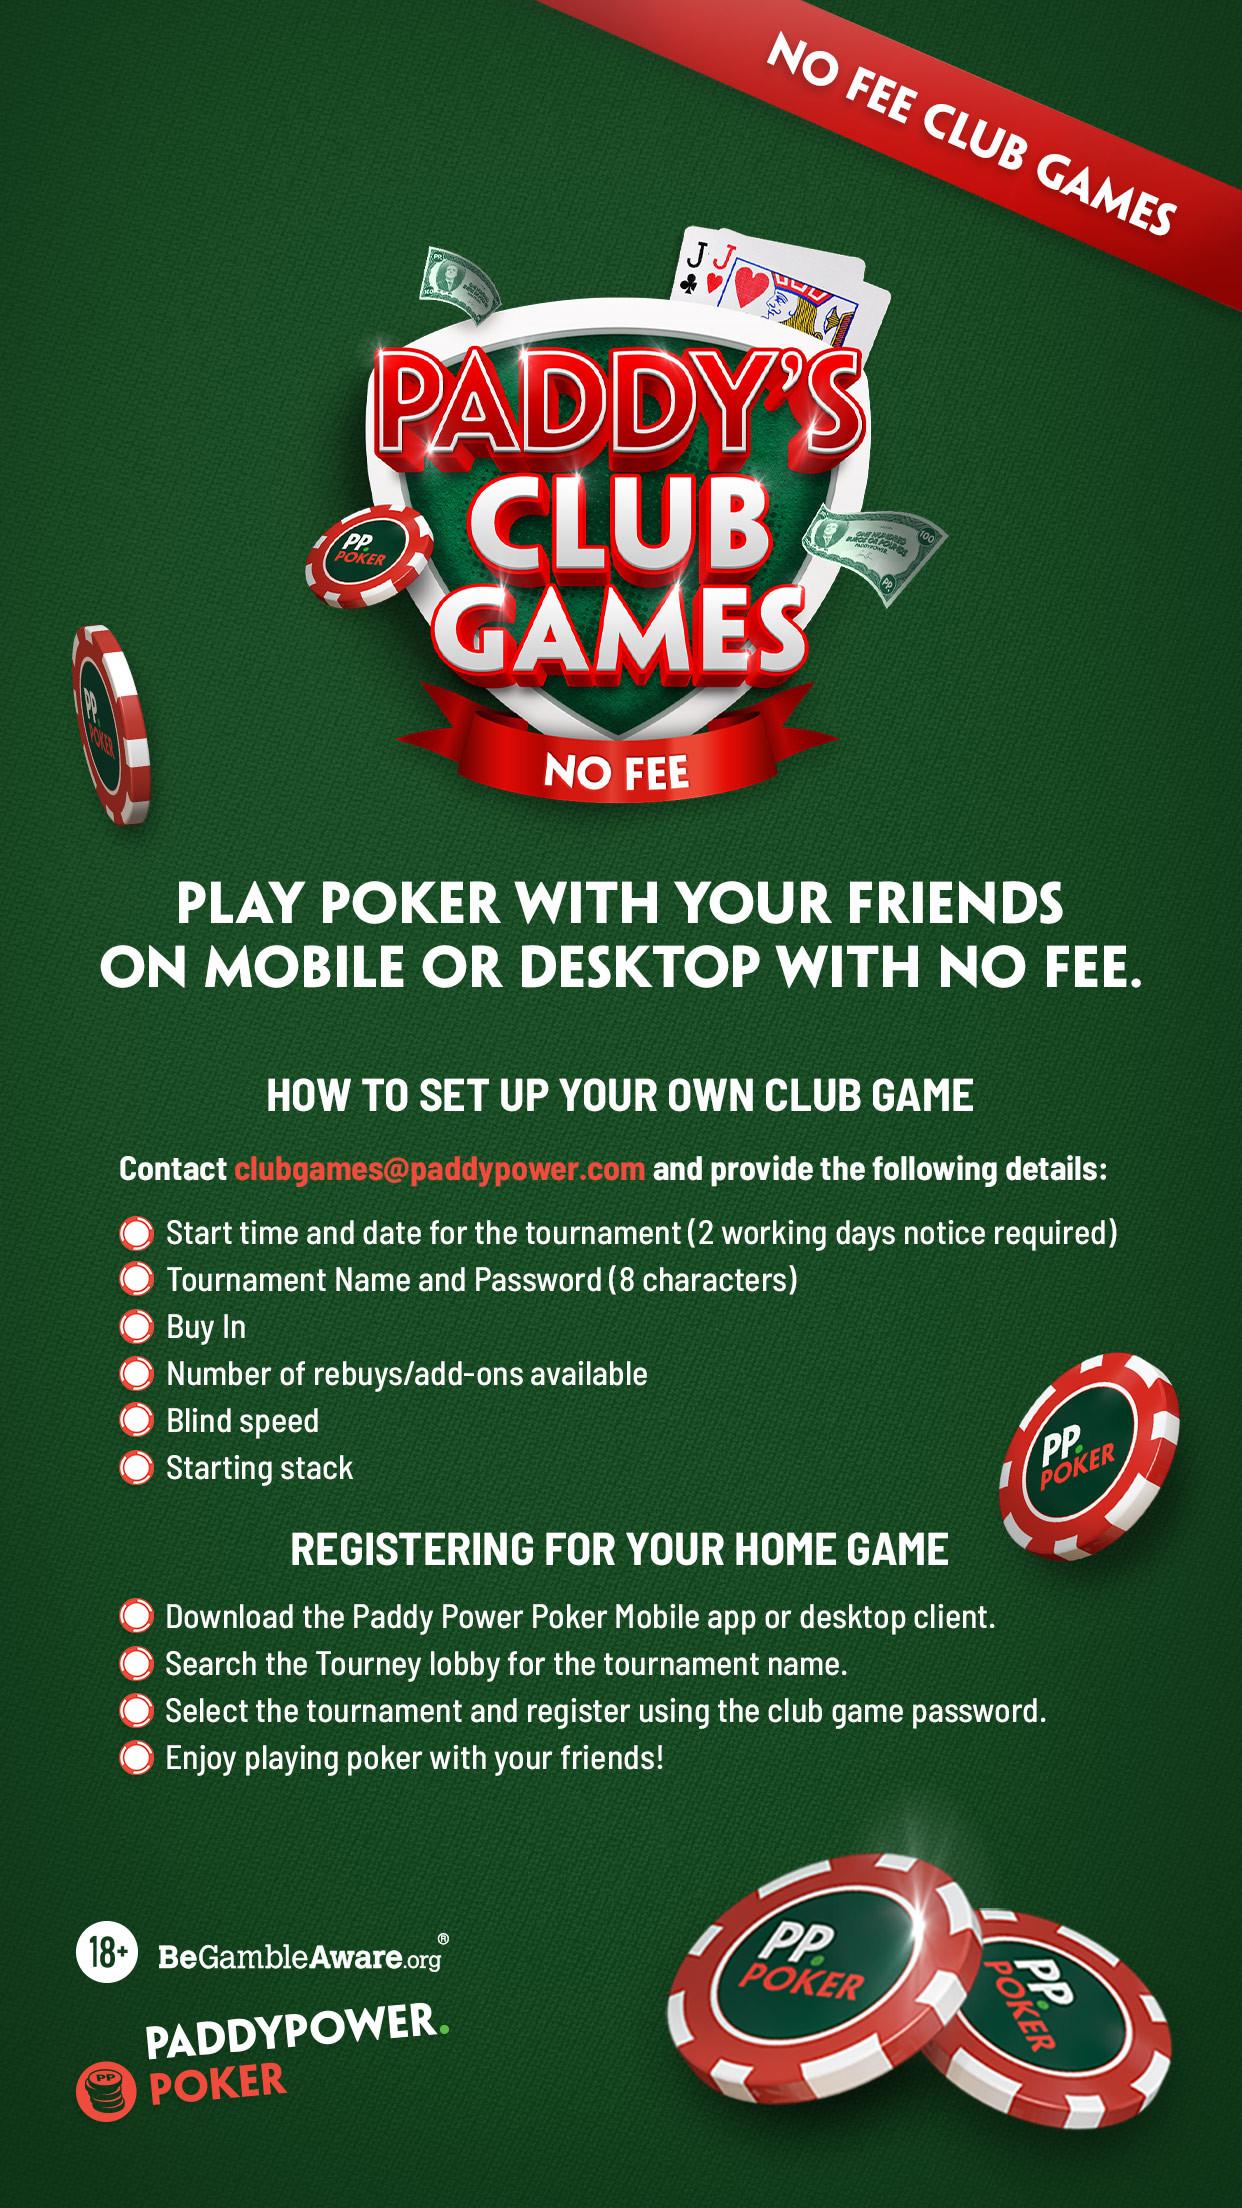 House of roulette dares lyrics